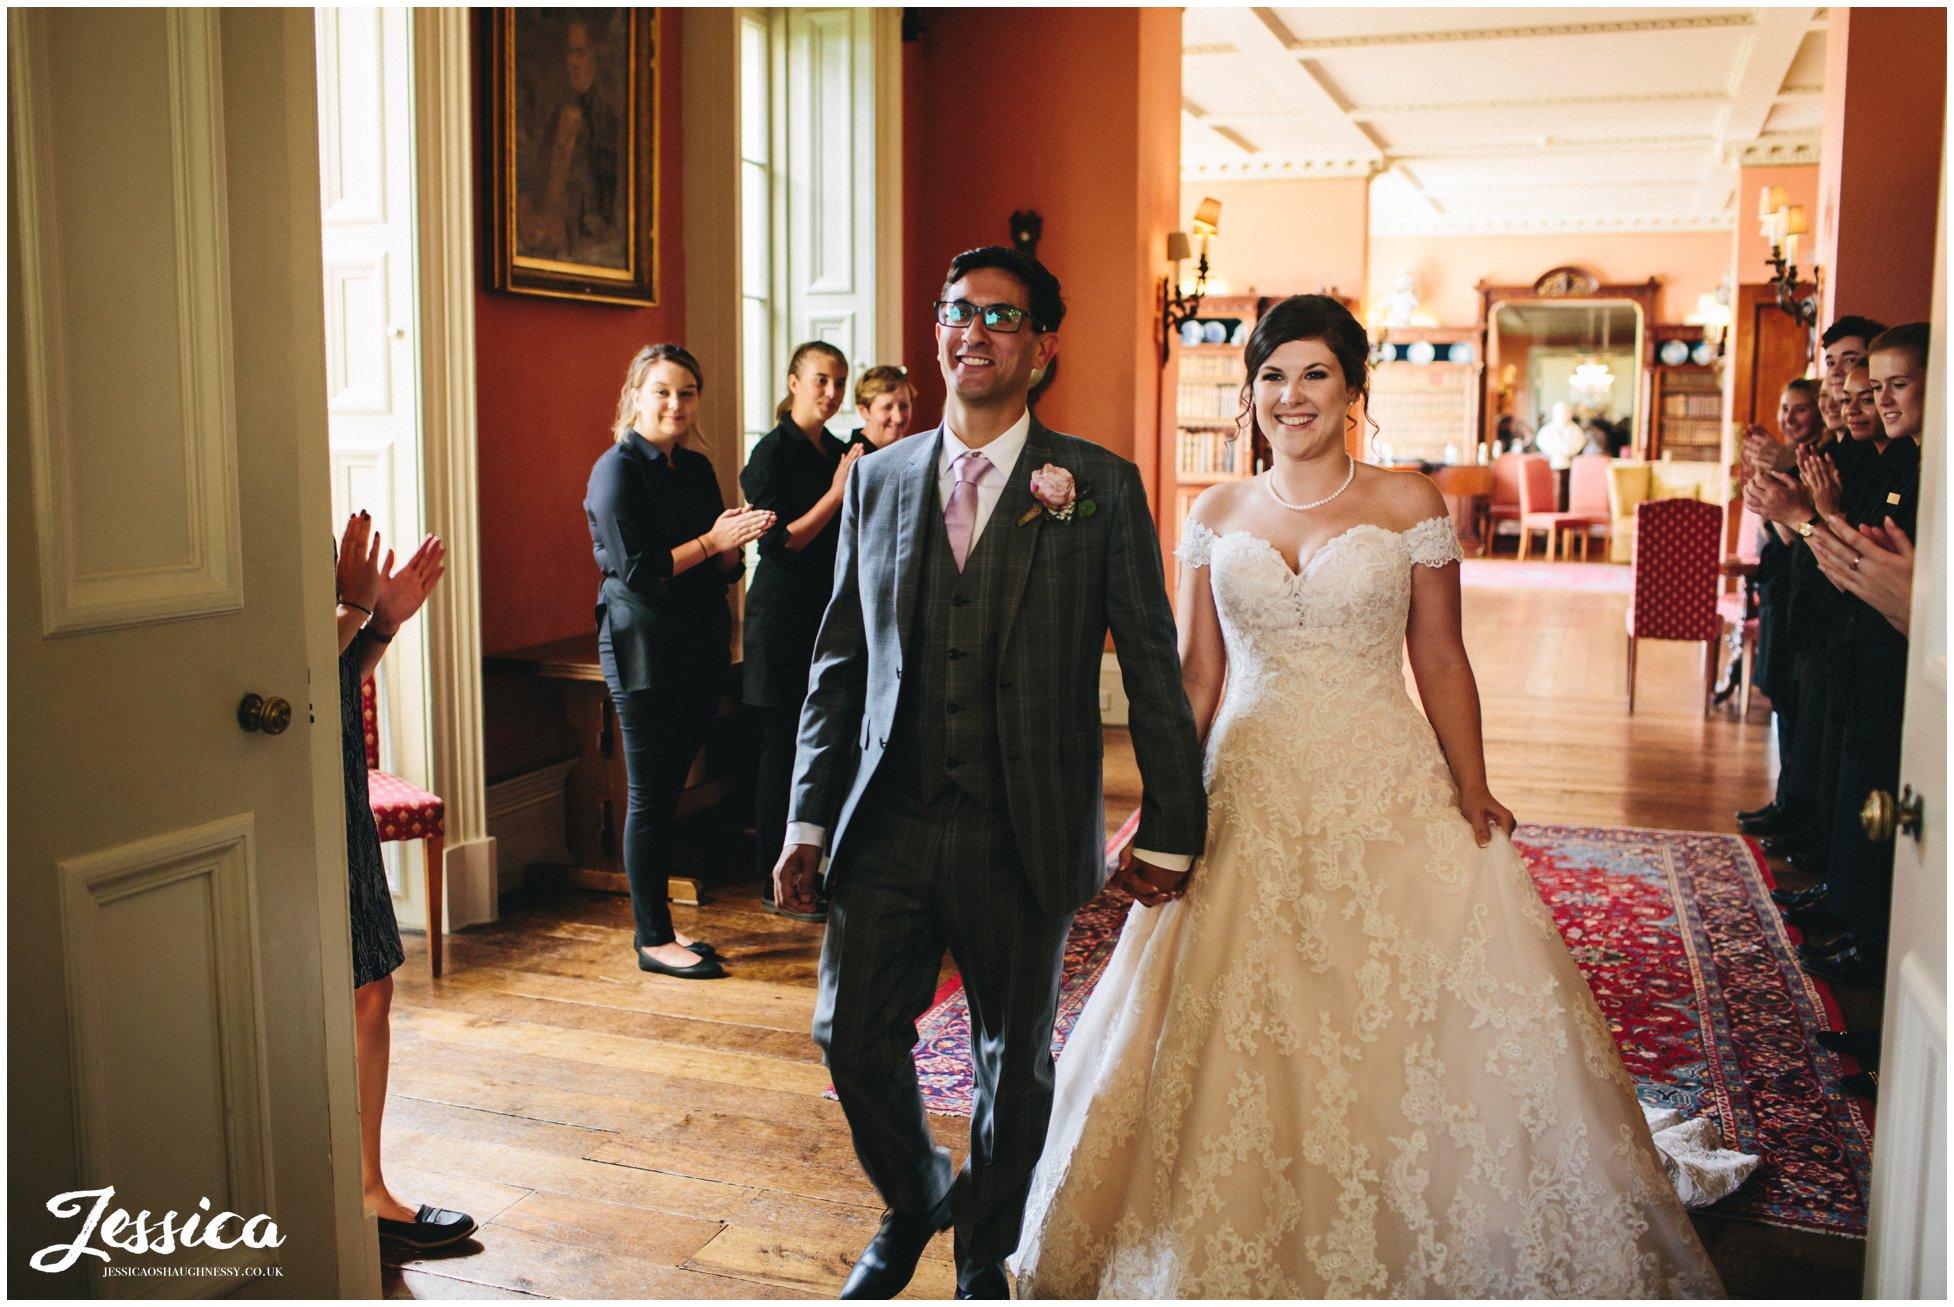 bride & groom get announced into their wedding breakfast